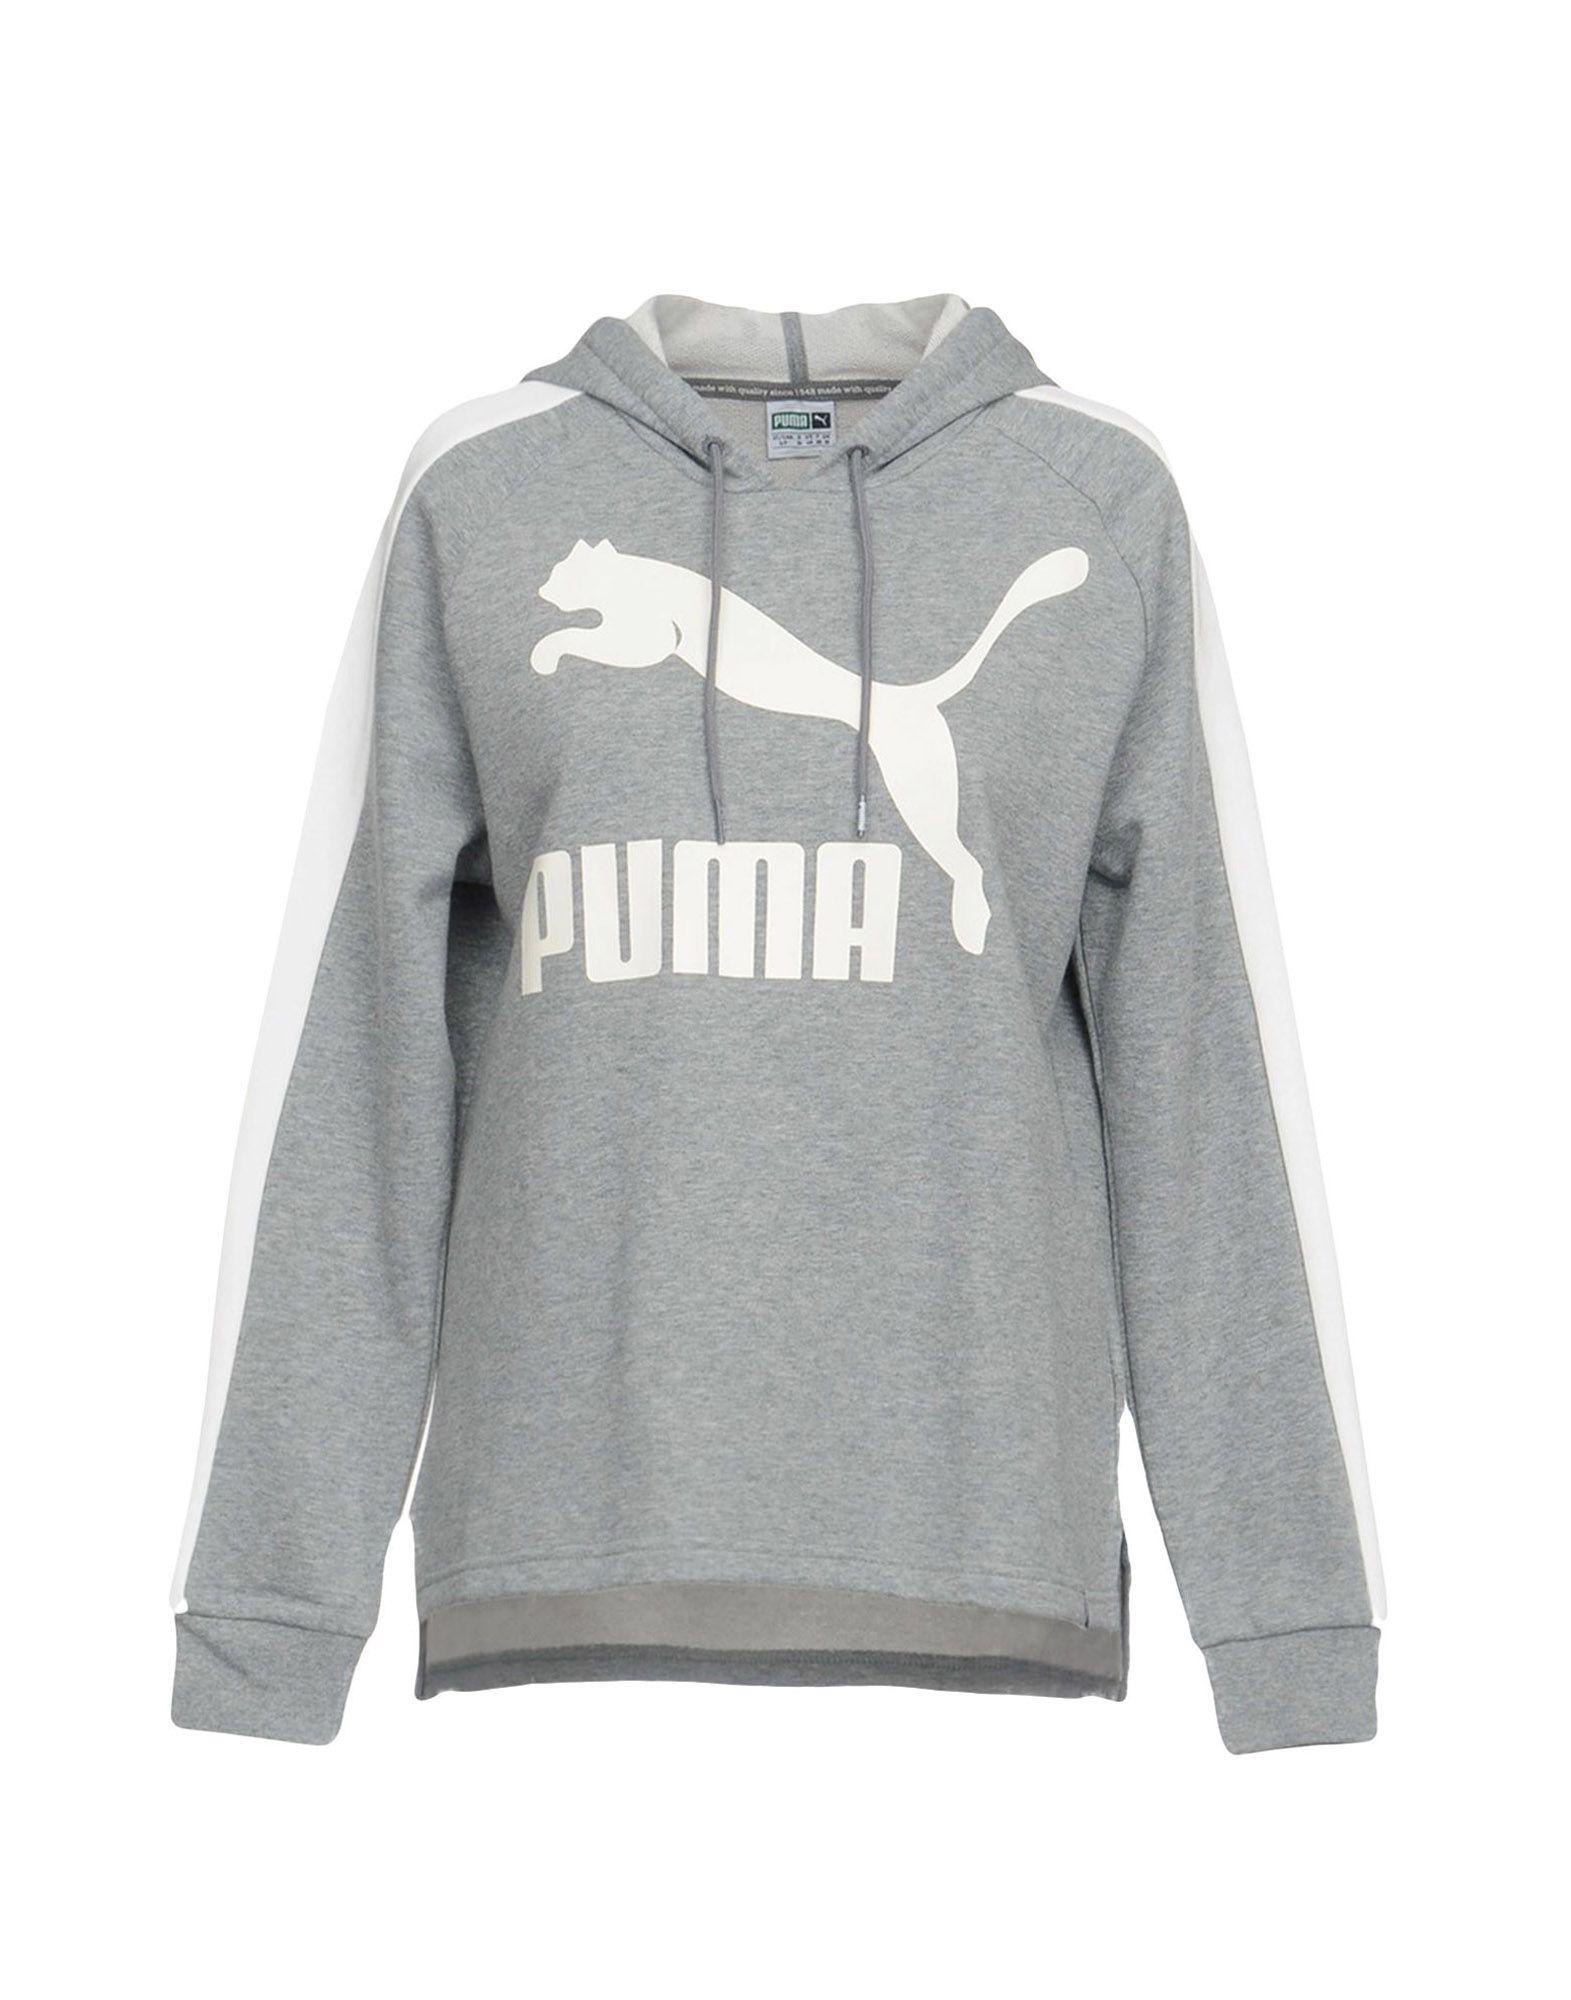 PUMA Damen Sweatshirt2 grau